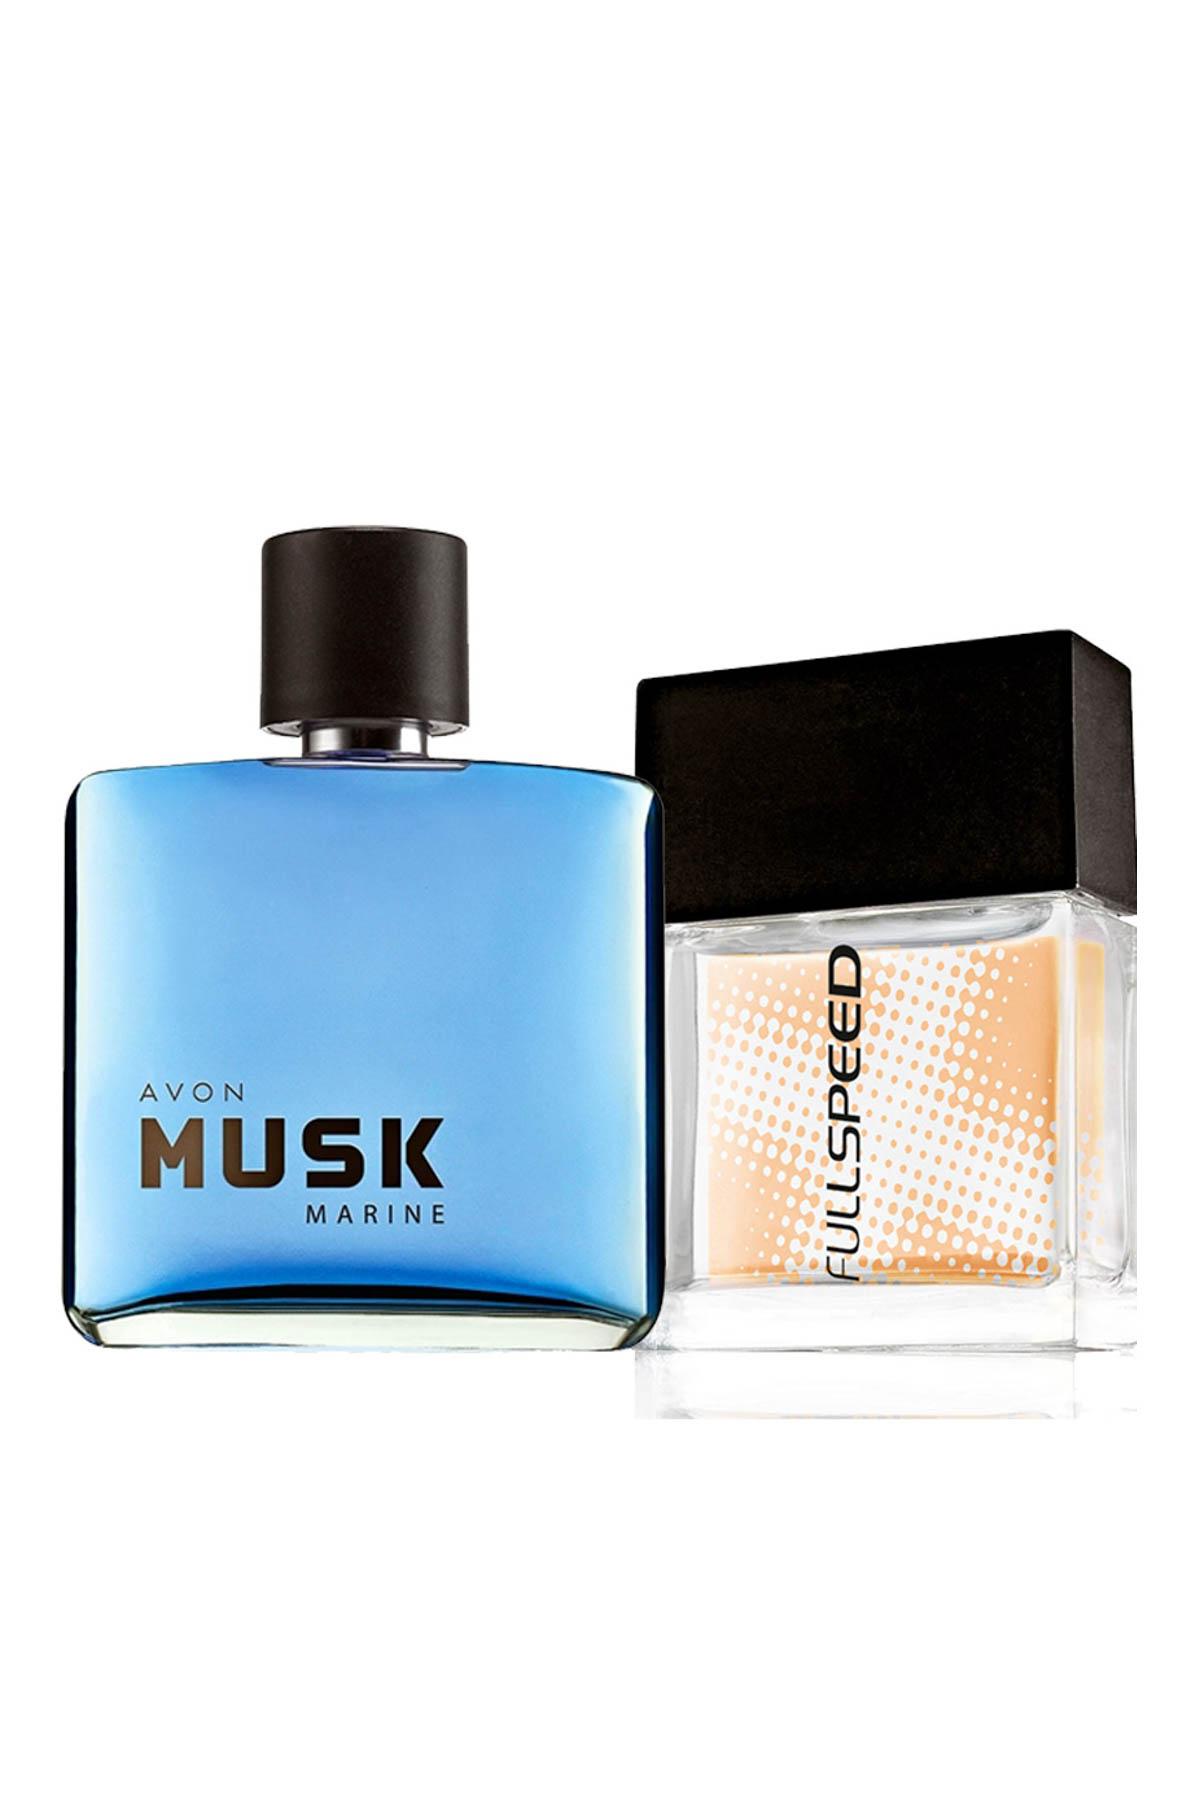 AVON Musk Marine & Full Speed 2'li Erkek Parfüm Seti 8681298982883 1